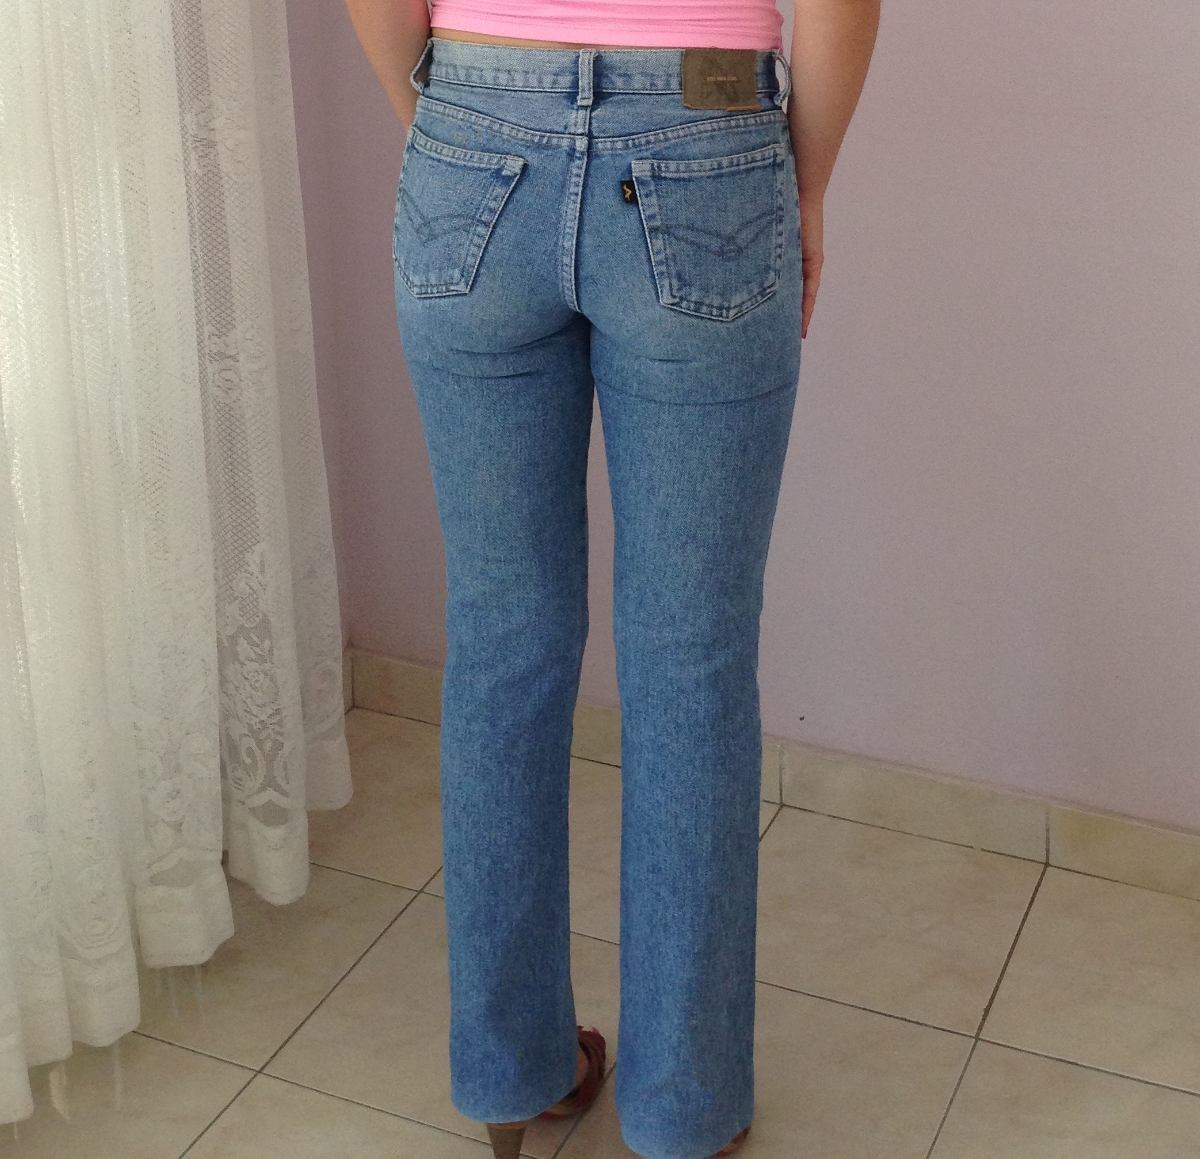 cal a jeans 36 vide bula colcci farm zara forum r 30 00 no mercadolivre. Black Bedroom Furniture Sets. Home Design Ideas